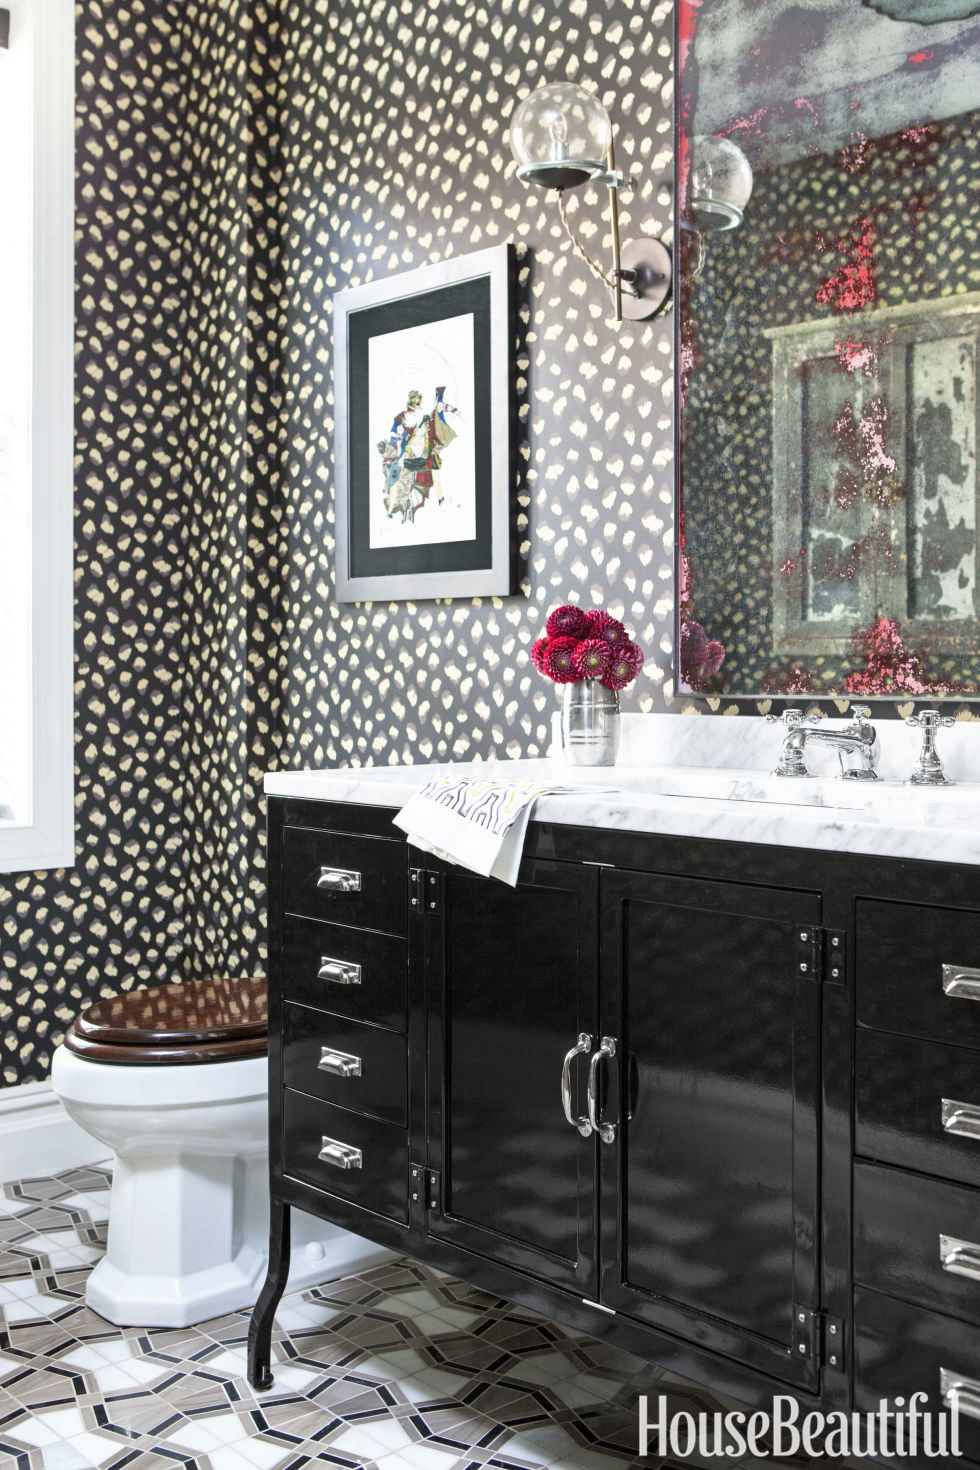 wallpaper designs for bathrooms download